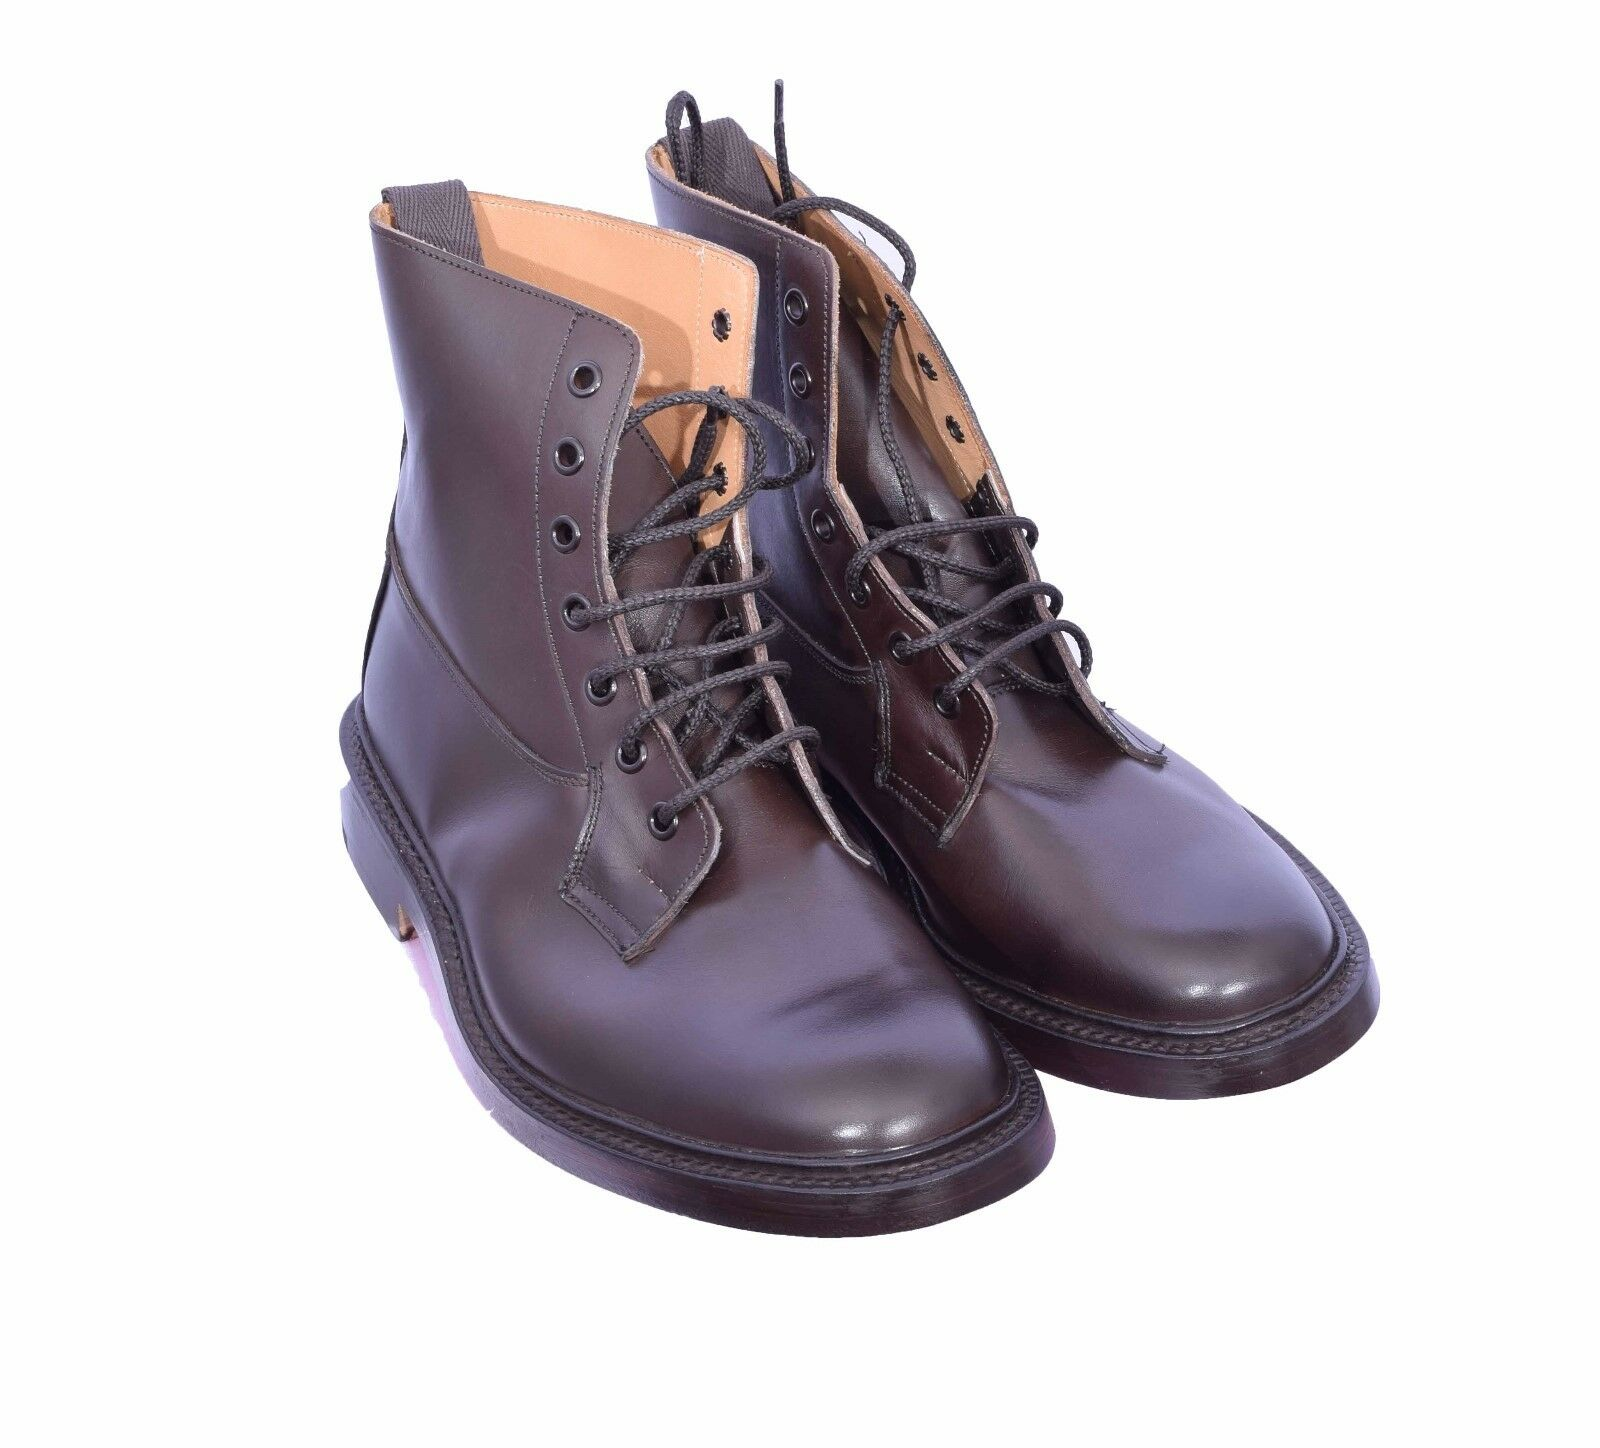 Trickers Men's Burford Espresso Boots Size 9